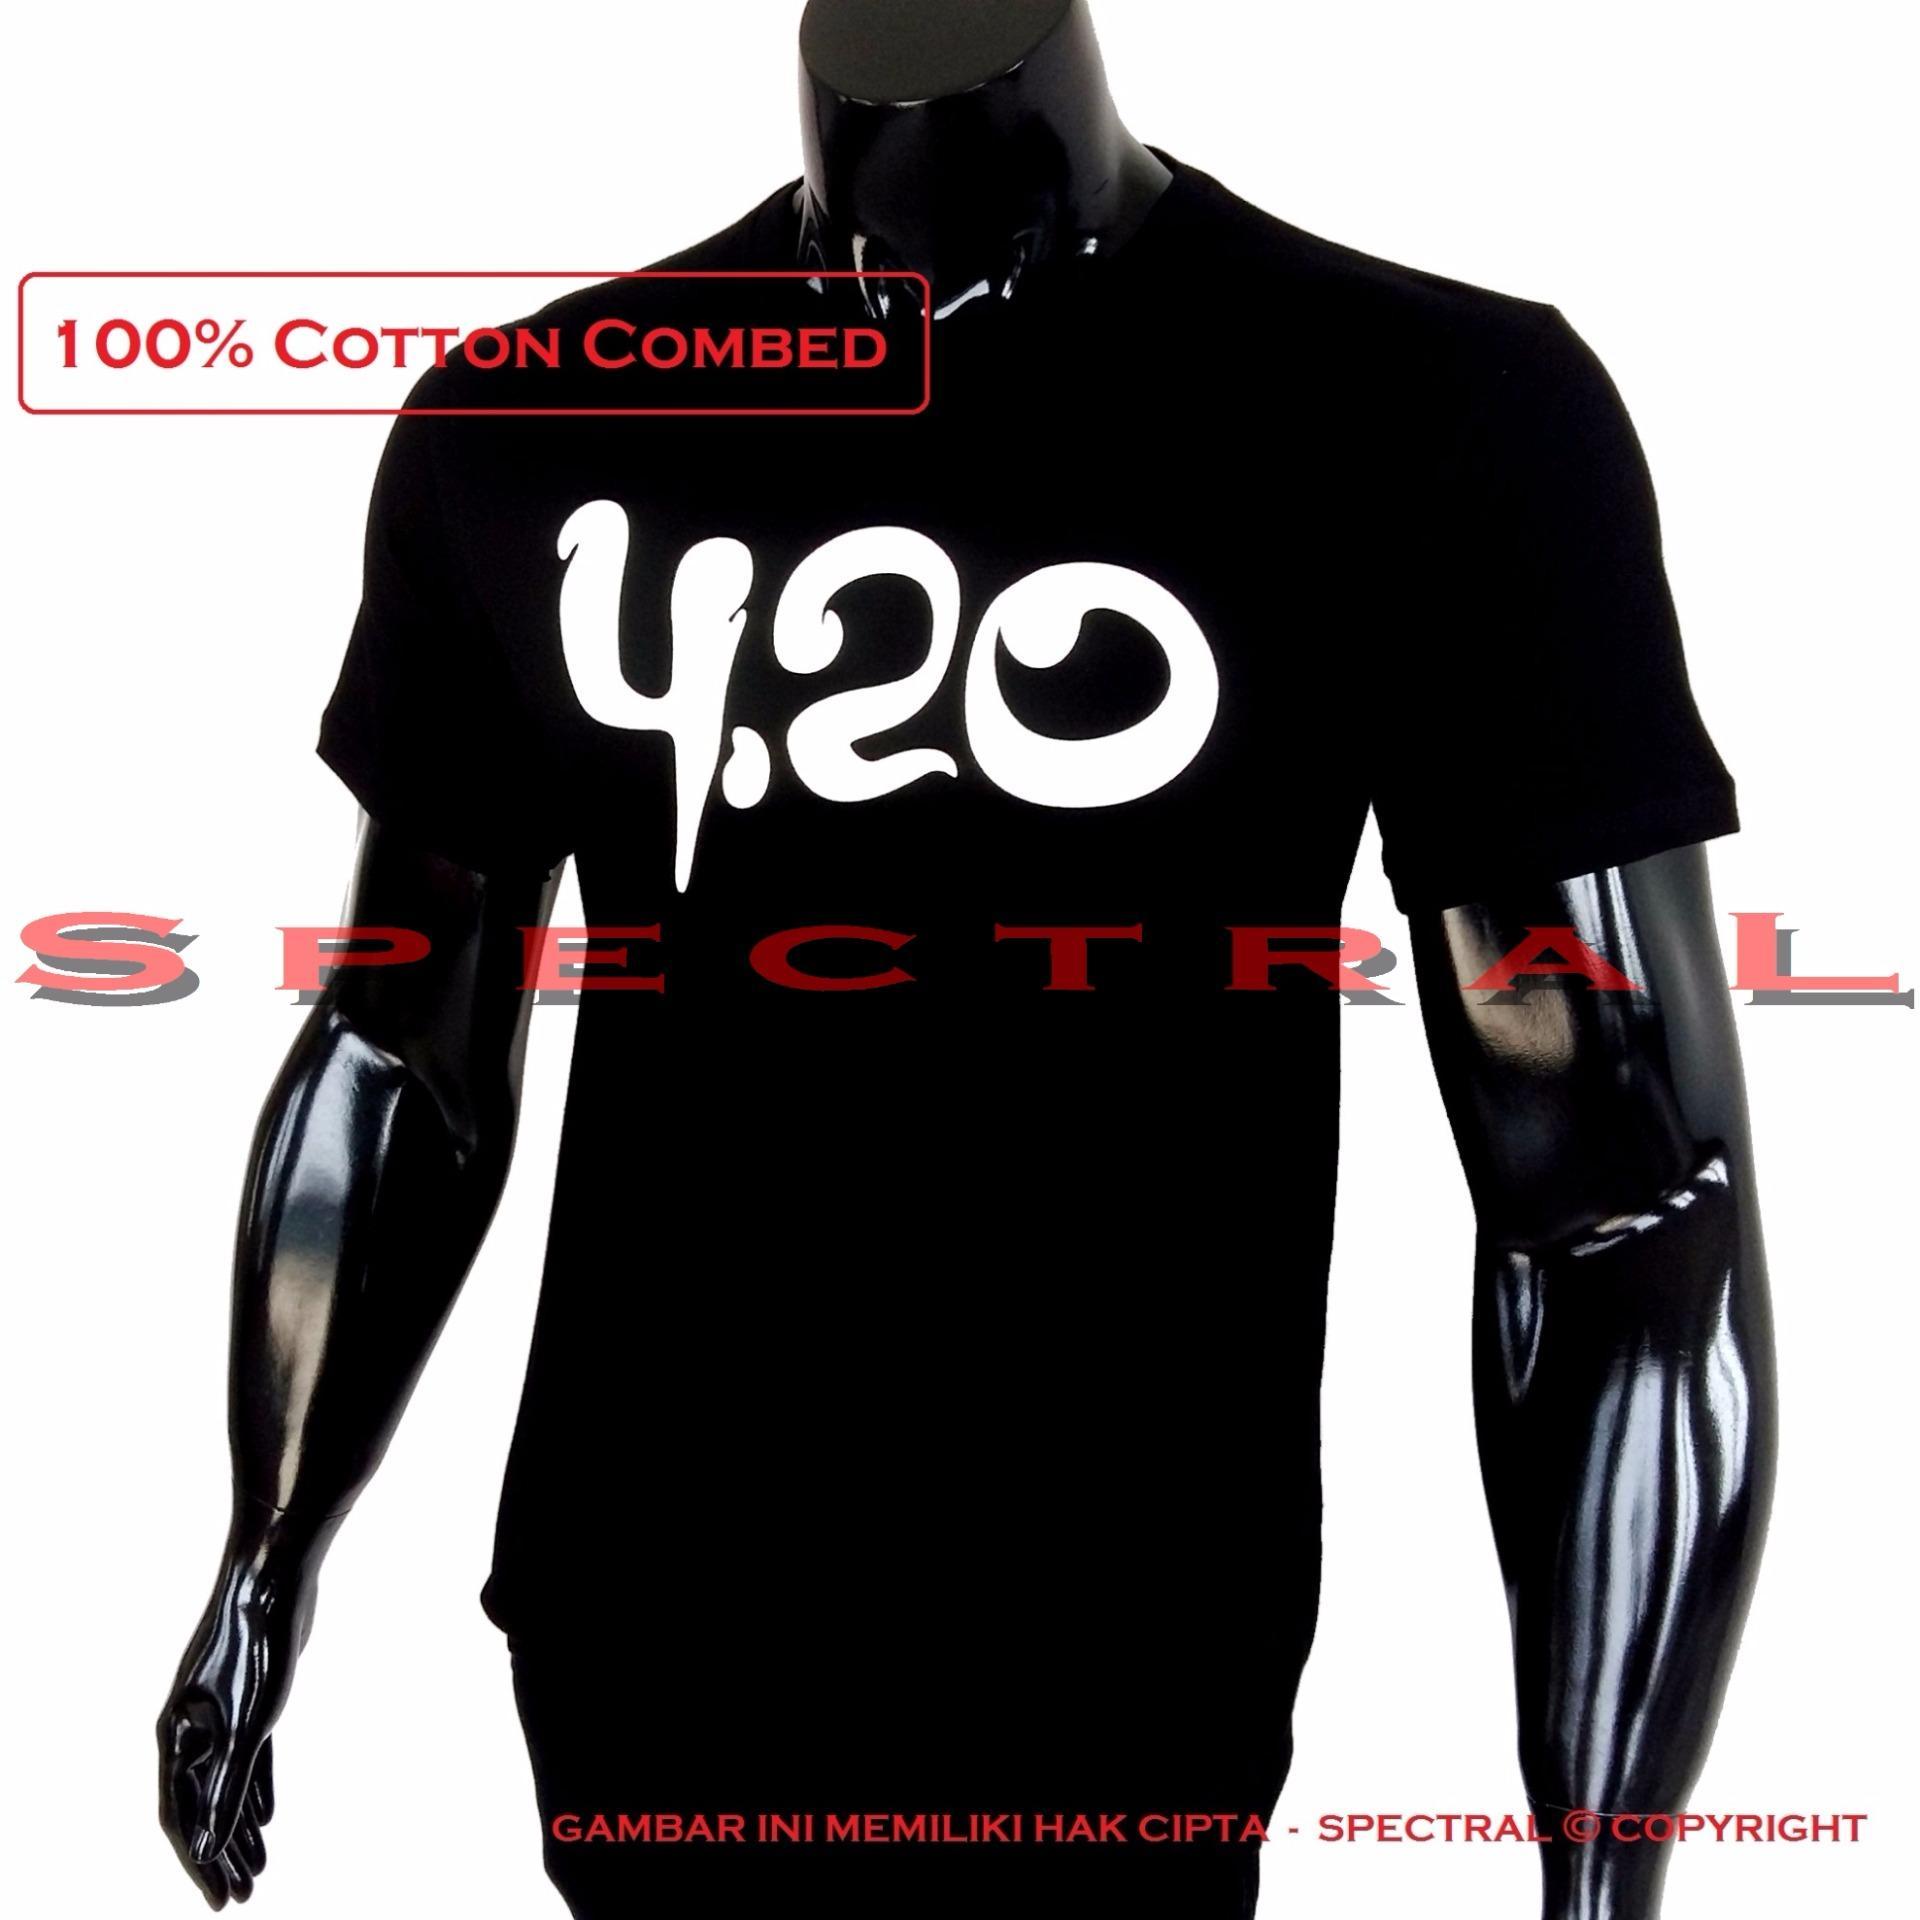 Spectral Kaos Distro T Shirt Fashion 100 Soft Cotton Combed 30s